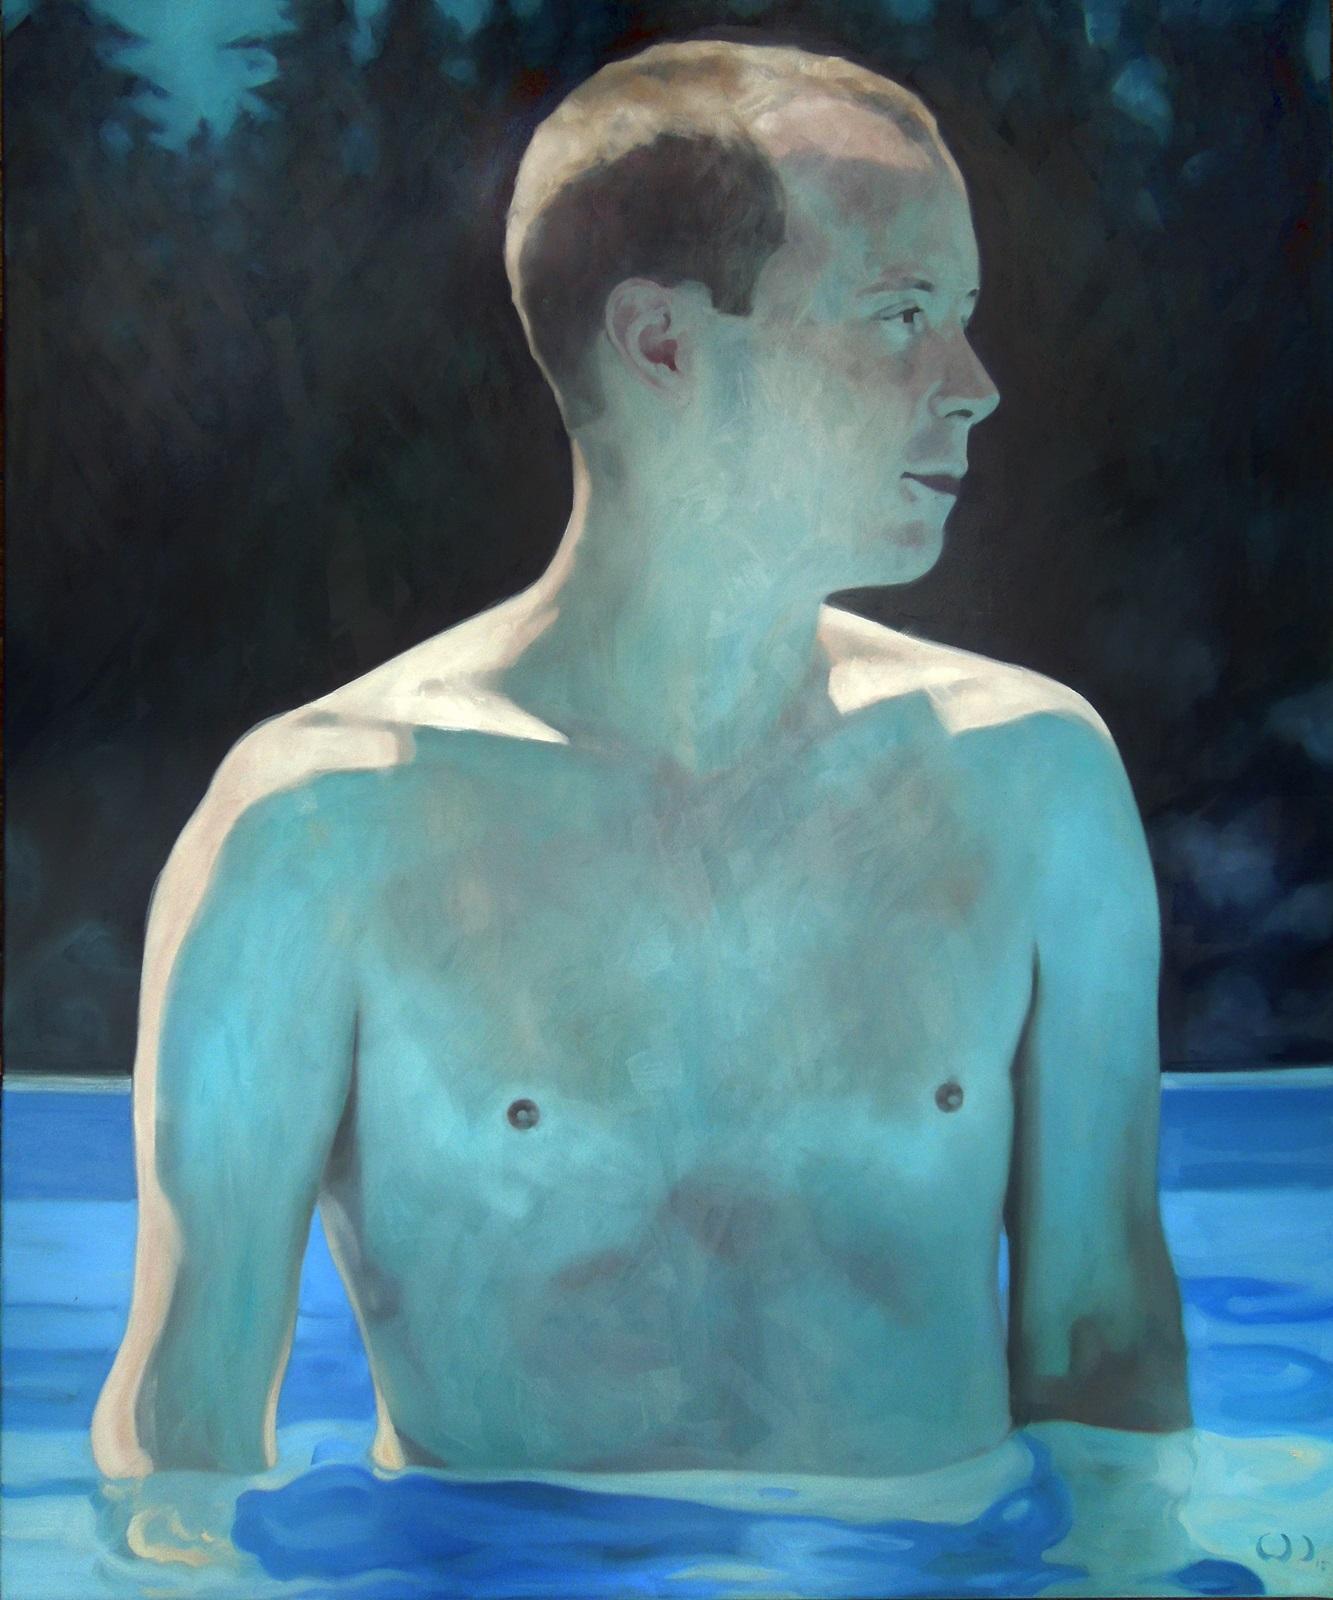 nightswimmer,_Öl_auf_Leinwand,_100x120cm